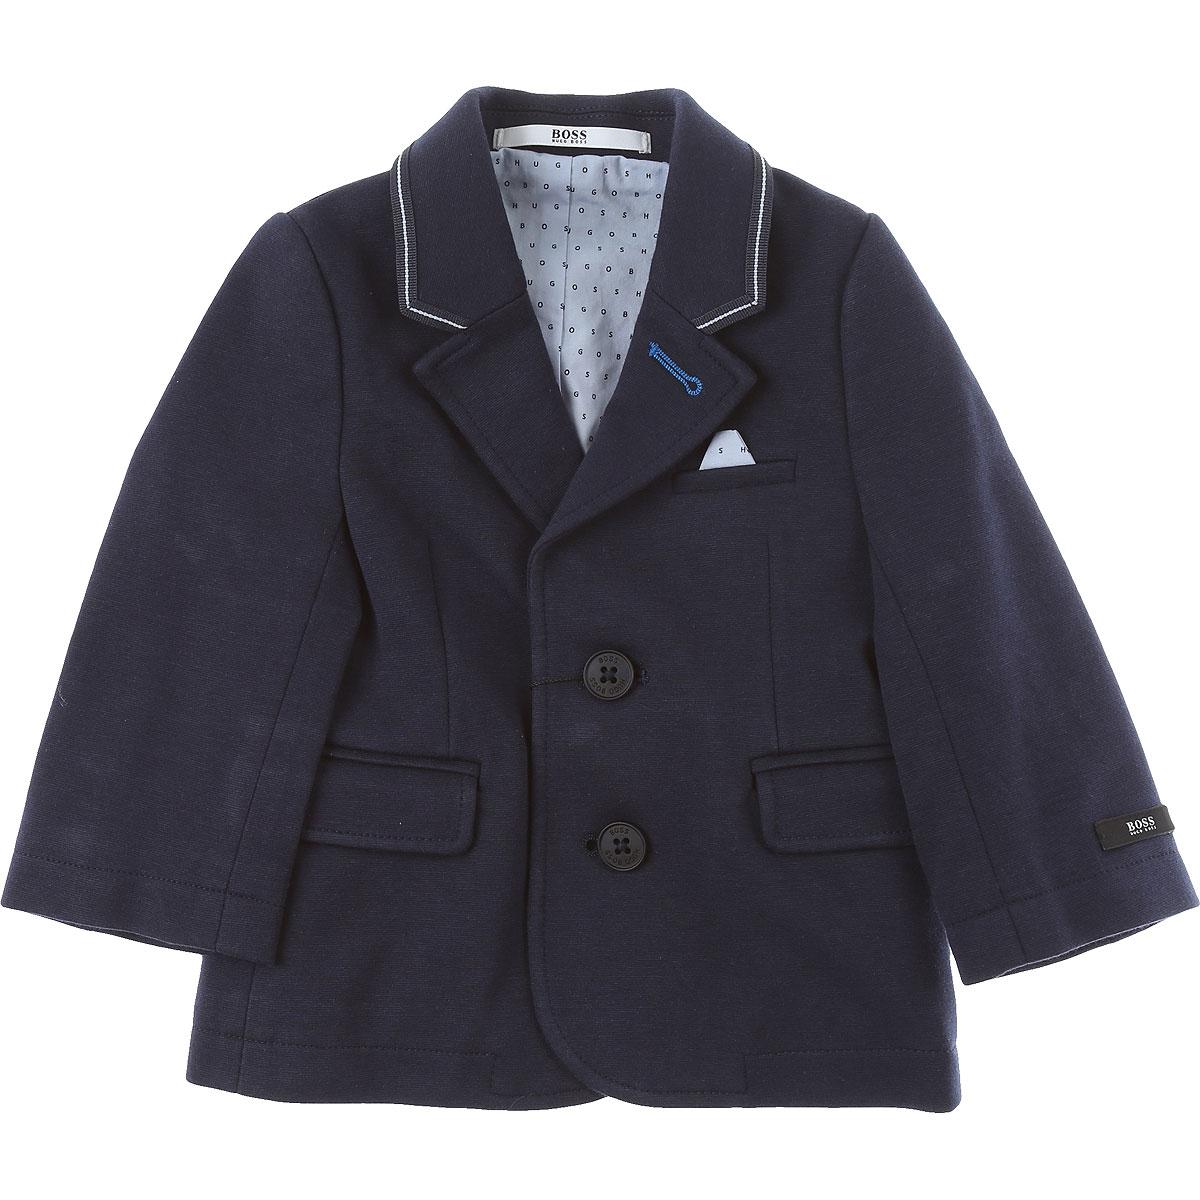 Hugo Boss Baby Jacket for Boys On Sale, Blue, Cotton, 2019, 18M 2Y 3Y 6M 9M